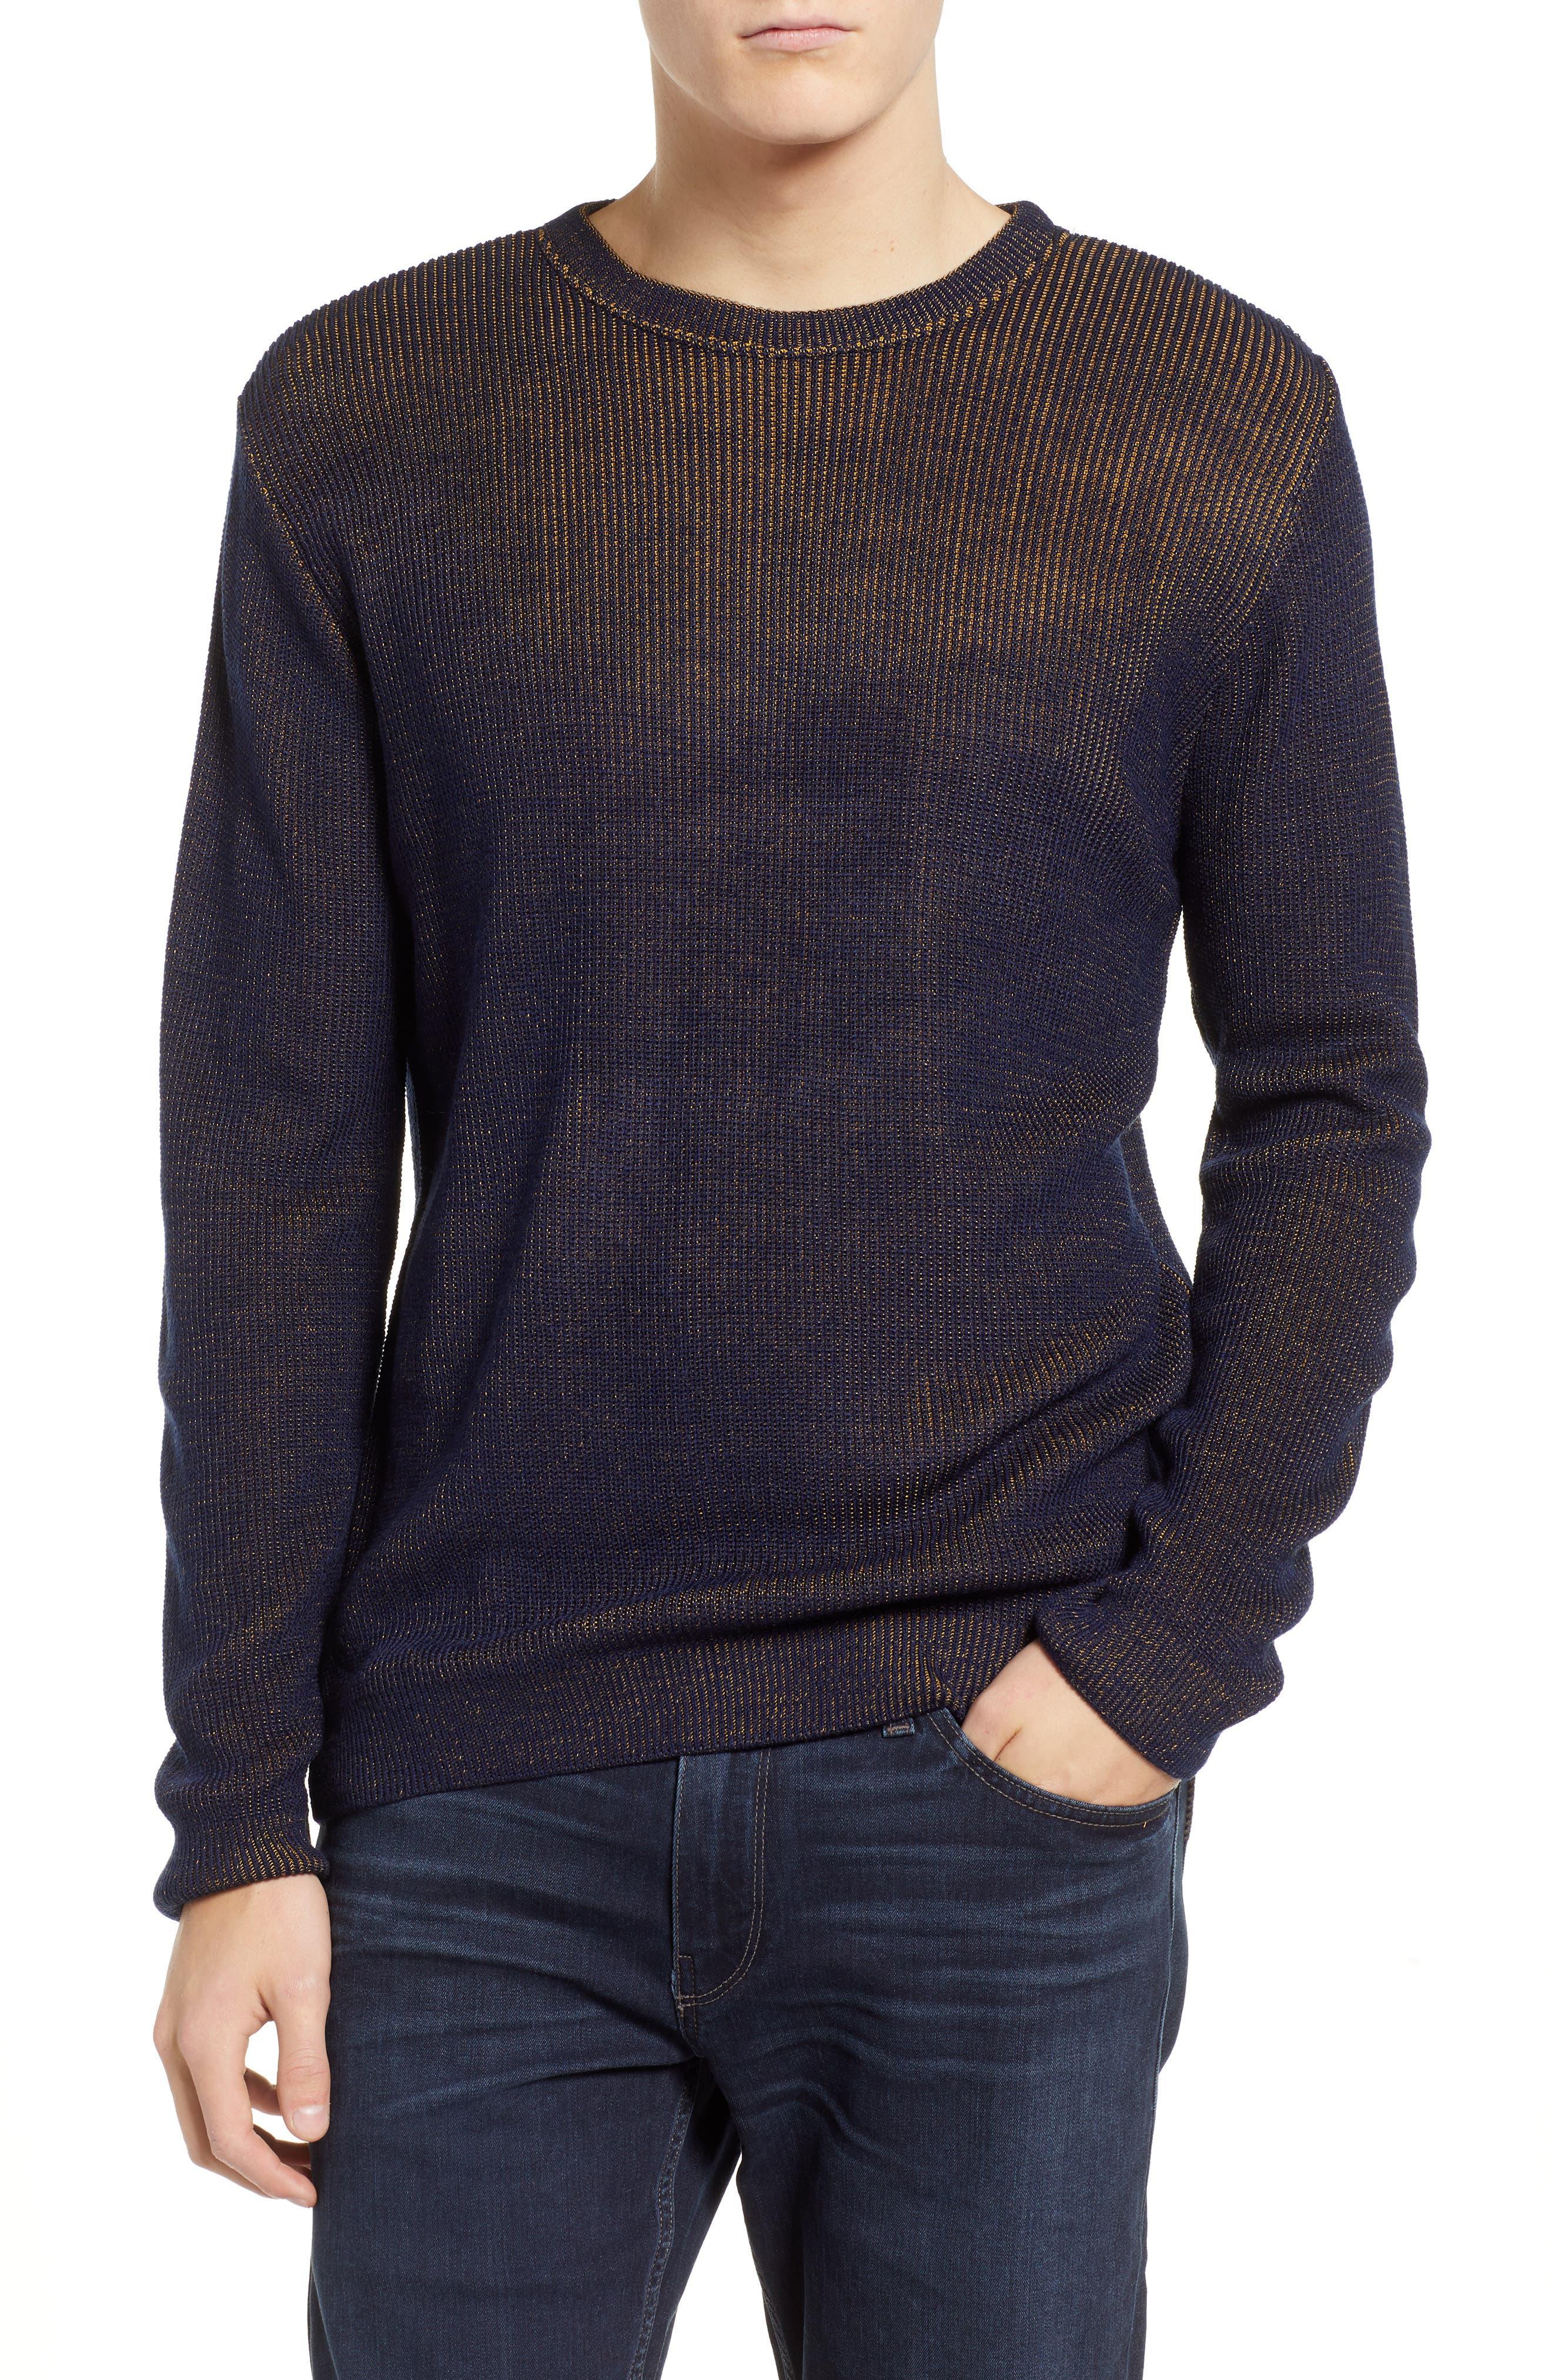 Plaited Crewneck Sweater,                             Main thumbnail 1, color,                             NAVY